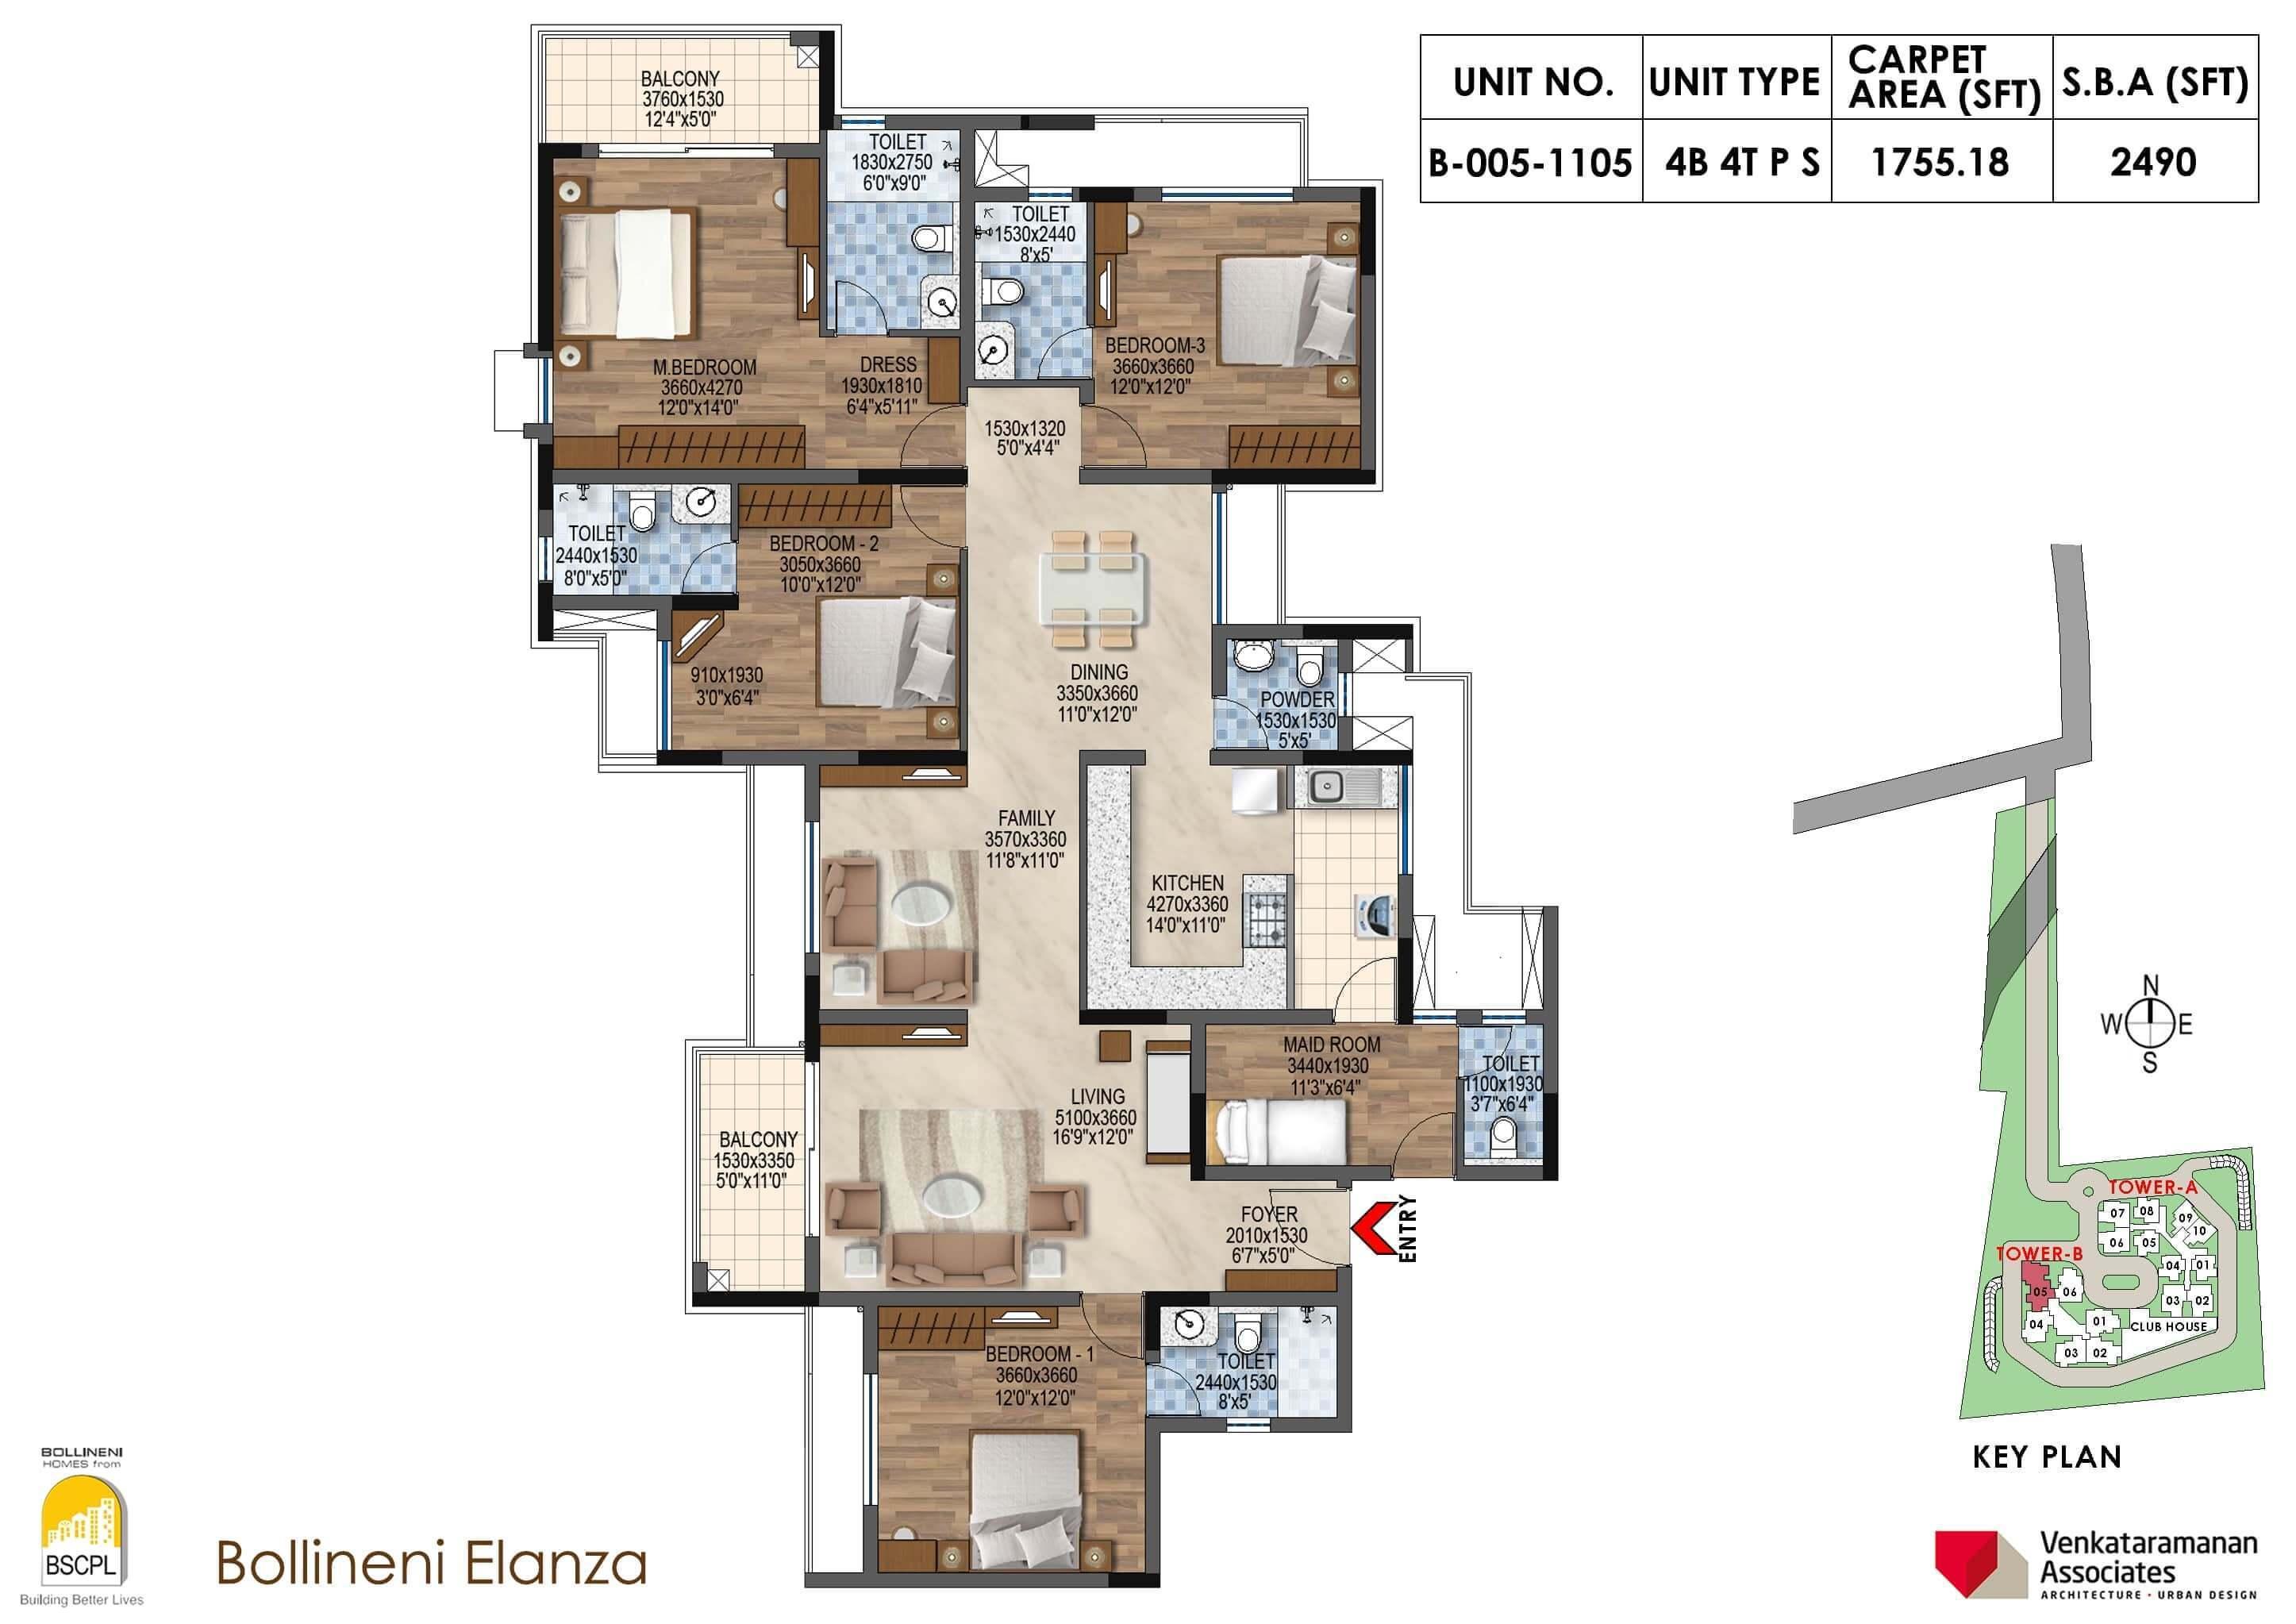 Bollineni Elanza 4 BHK 2490 Floorplan